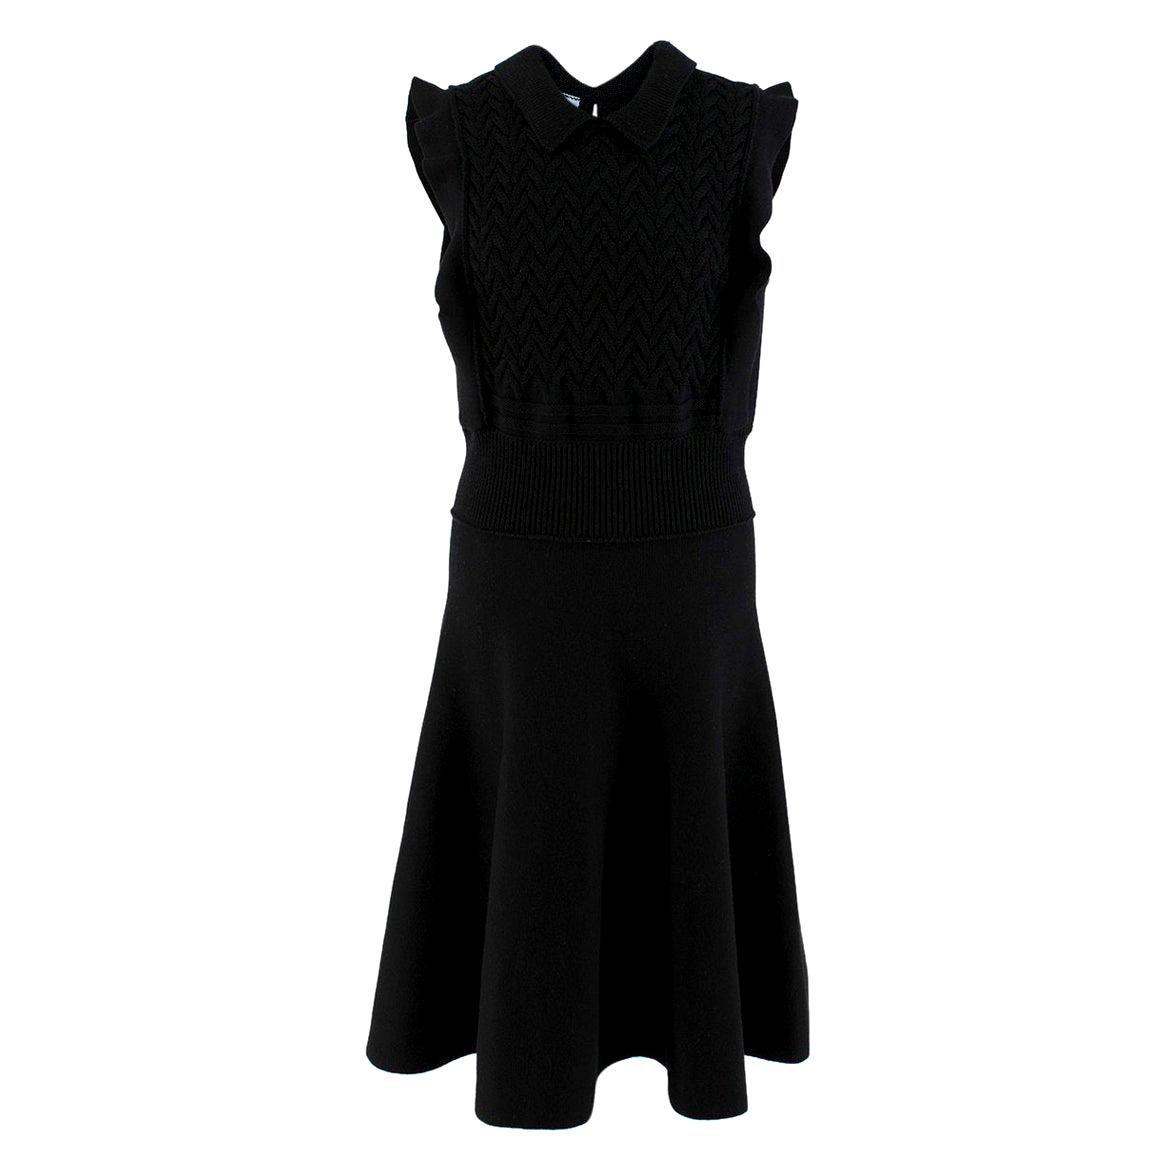 Prada Black Wool-blend Knit Dress - Size US 8